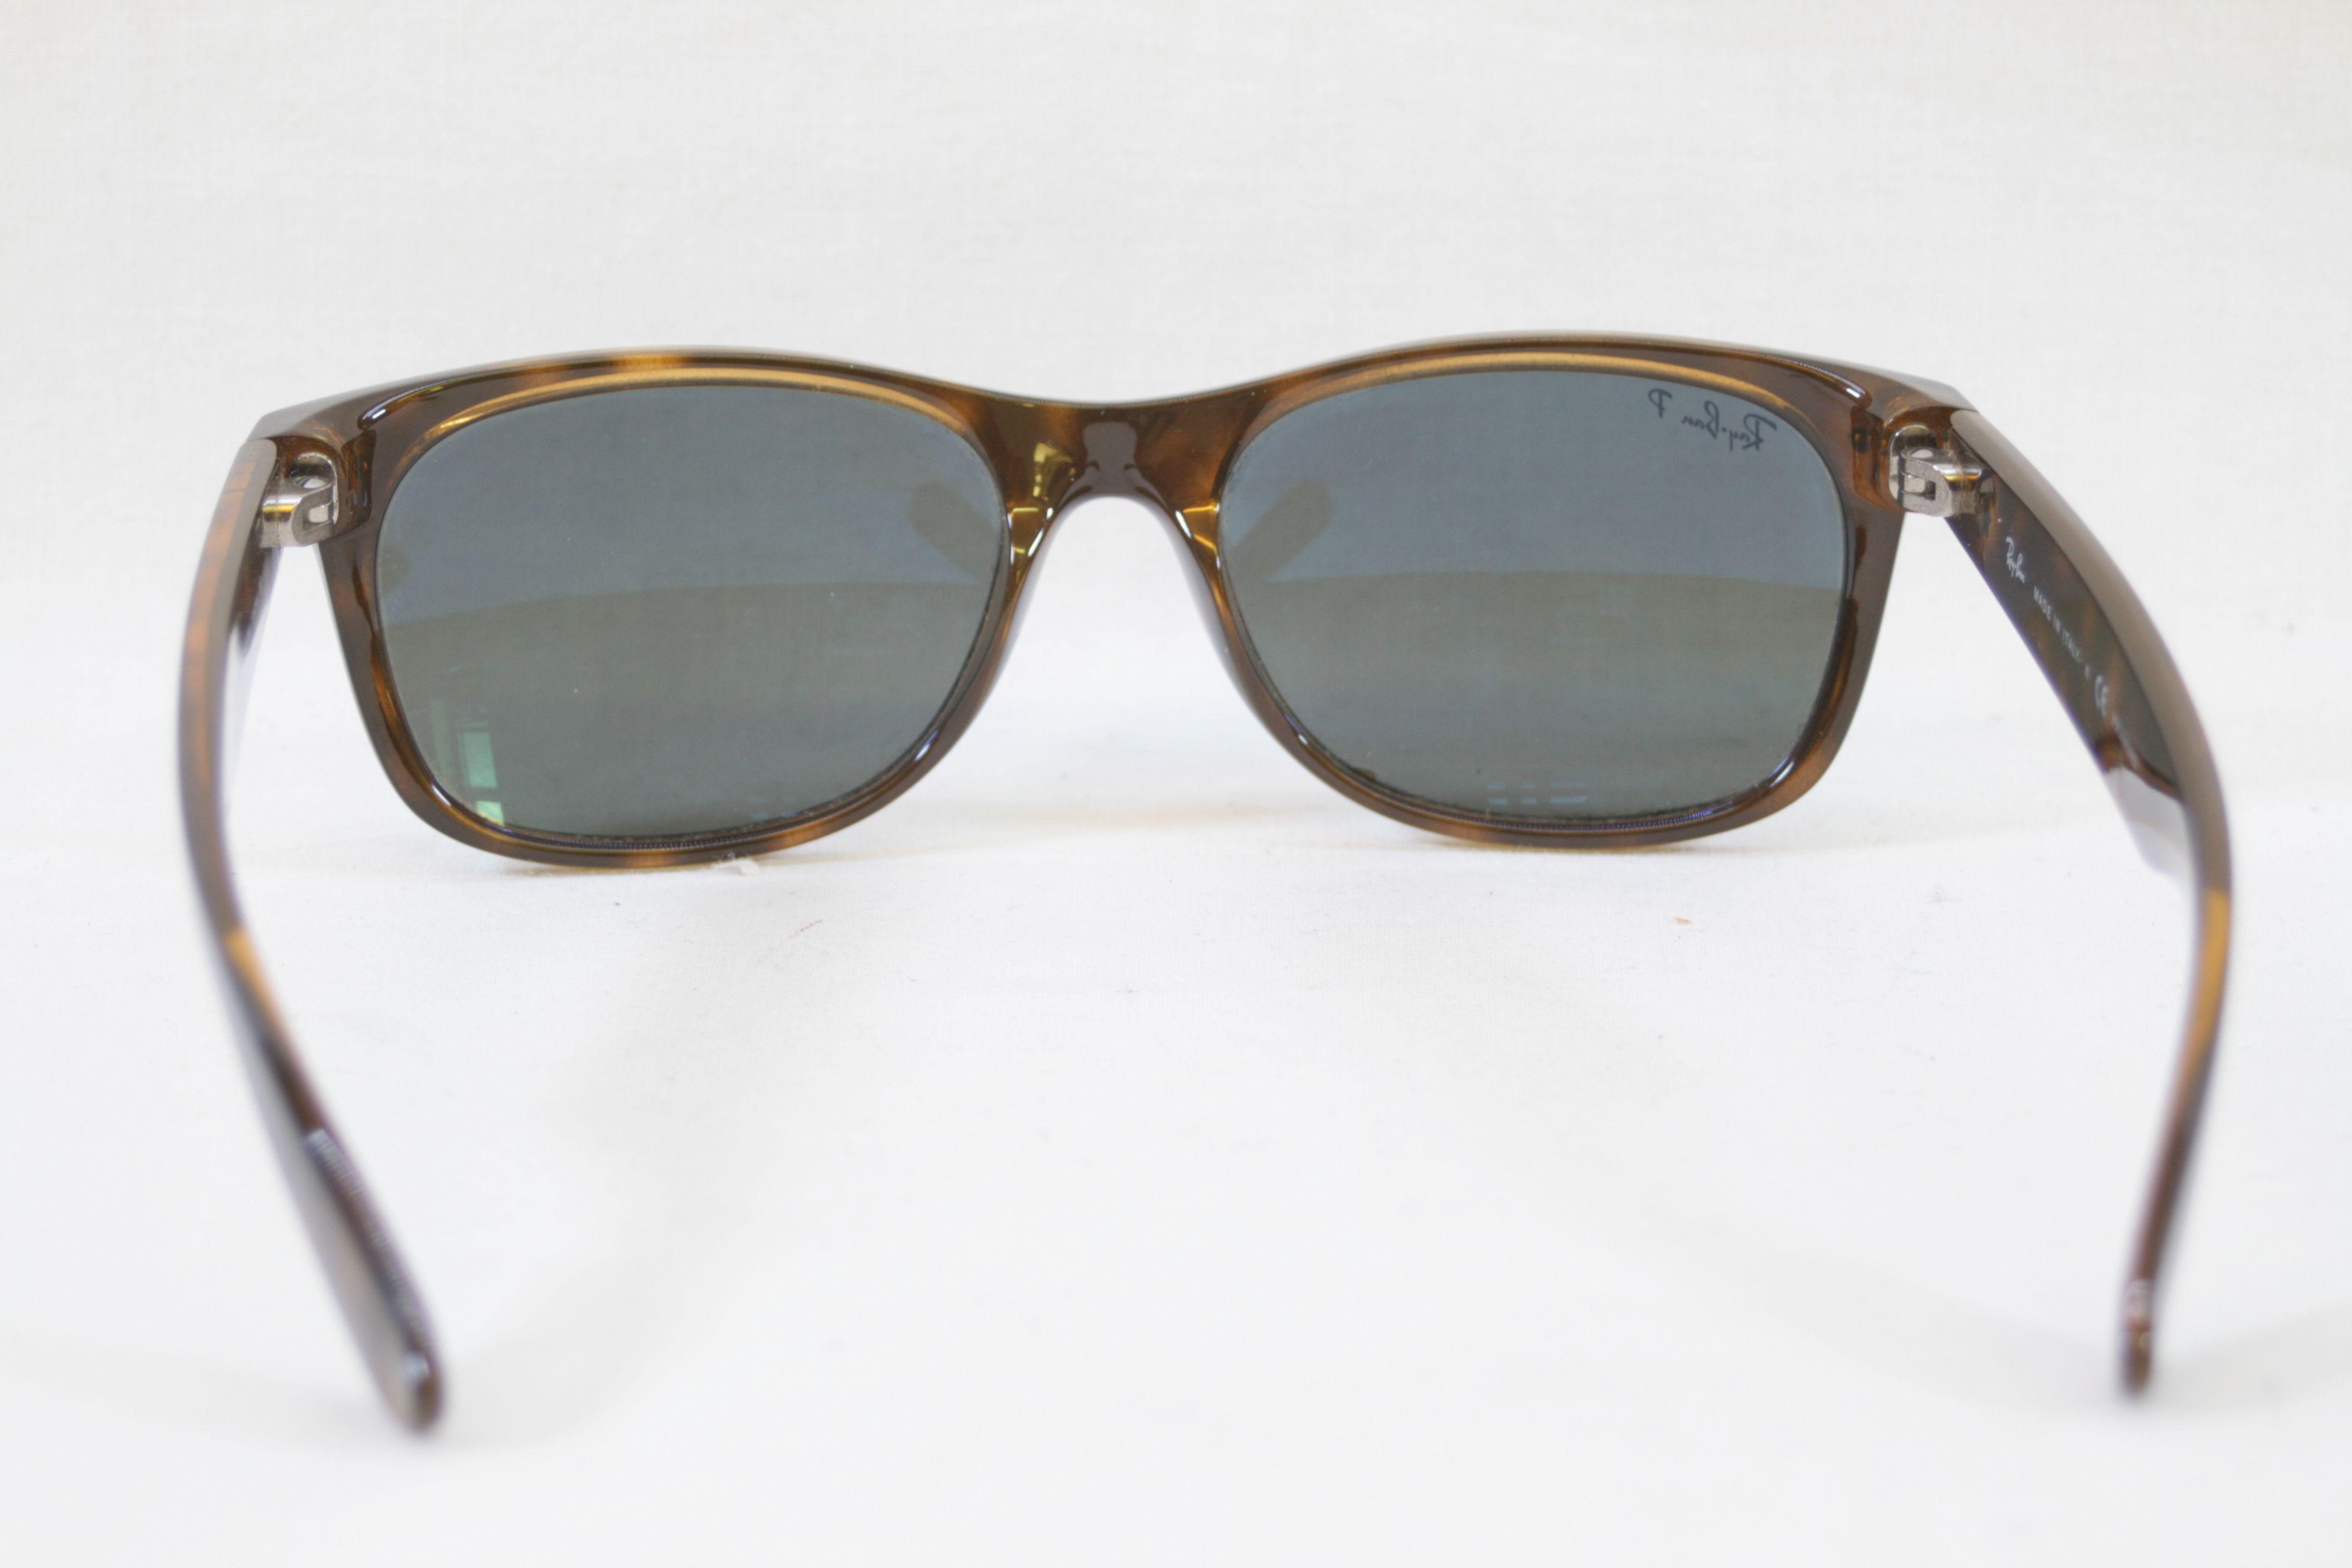 5cf1b65188fd8 Open Full-Size Image. Genuine Ray Ban New Wayfarer RB2132 902 58  Tortoiseshell Sunglasses 55-18 3